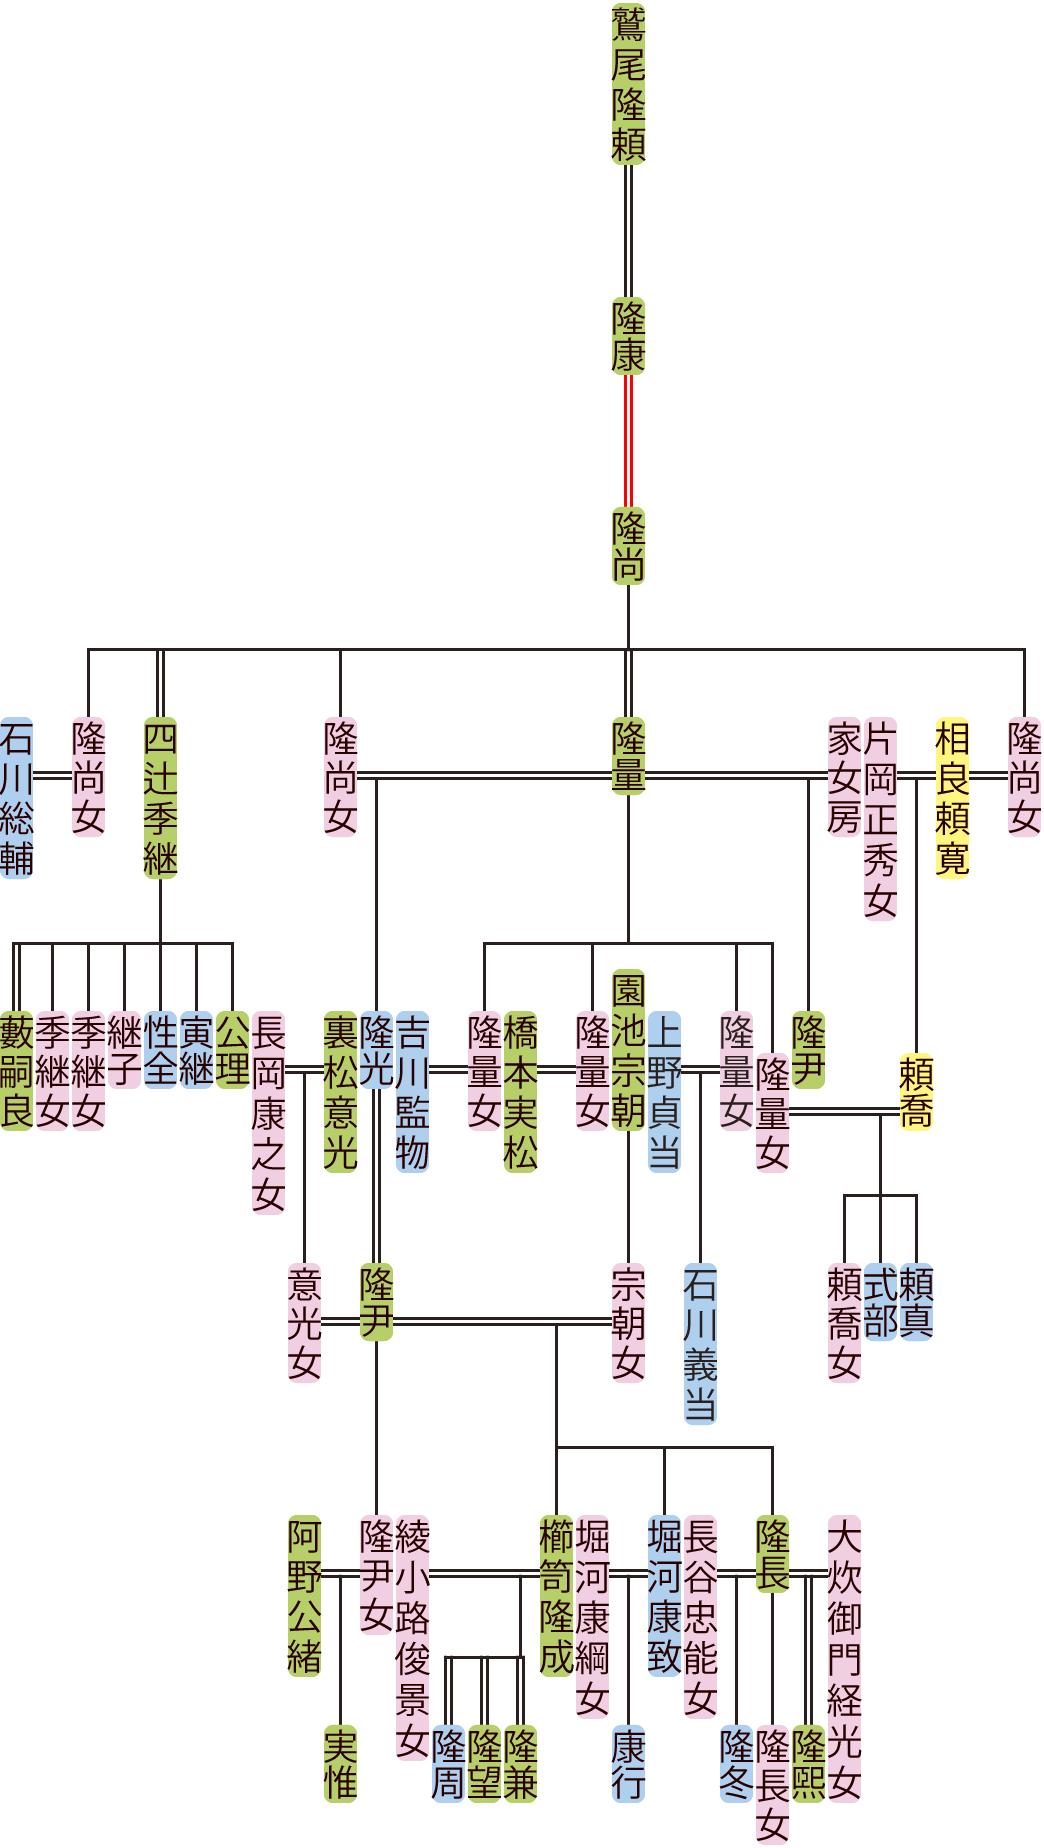 鷲尾隆尚~隆尹の系図